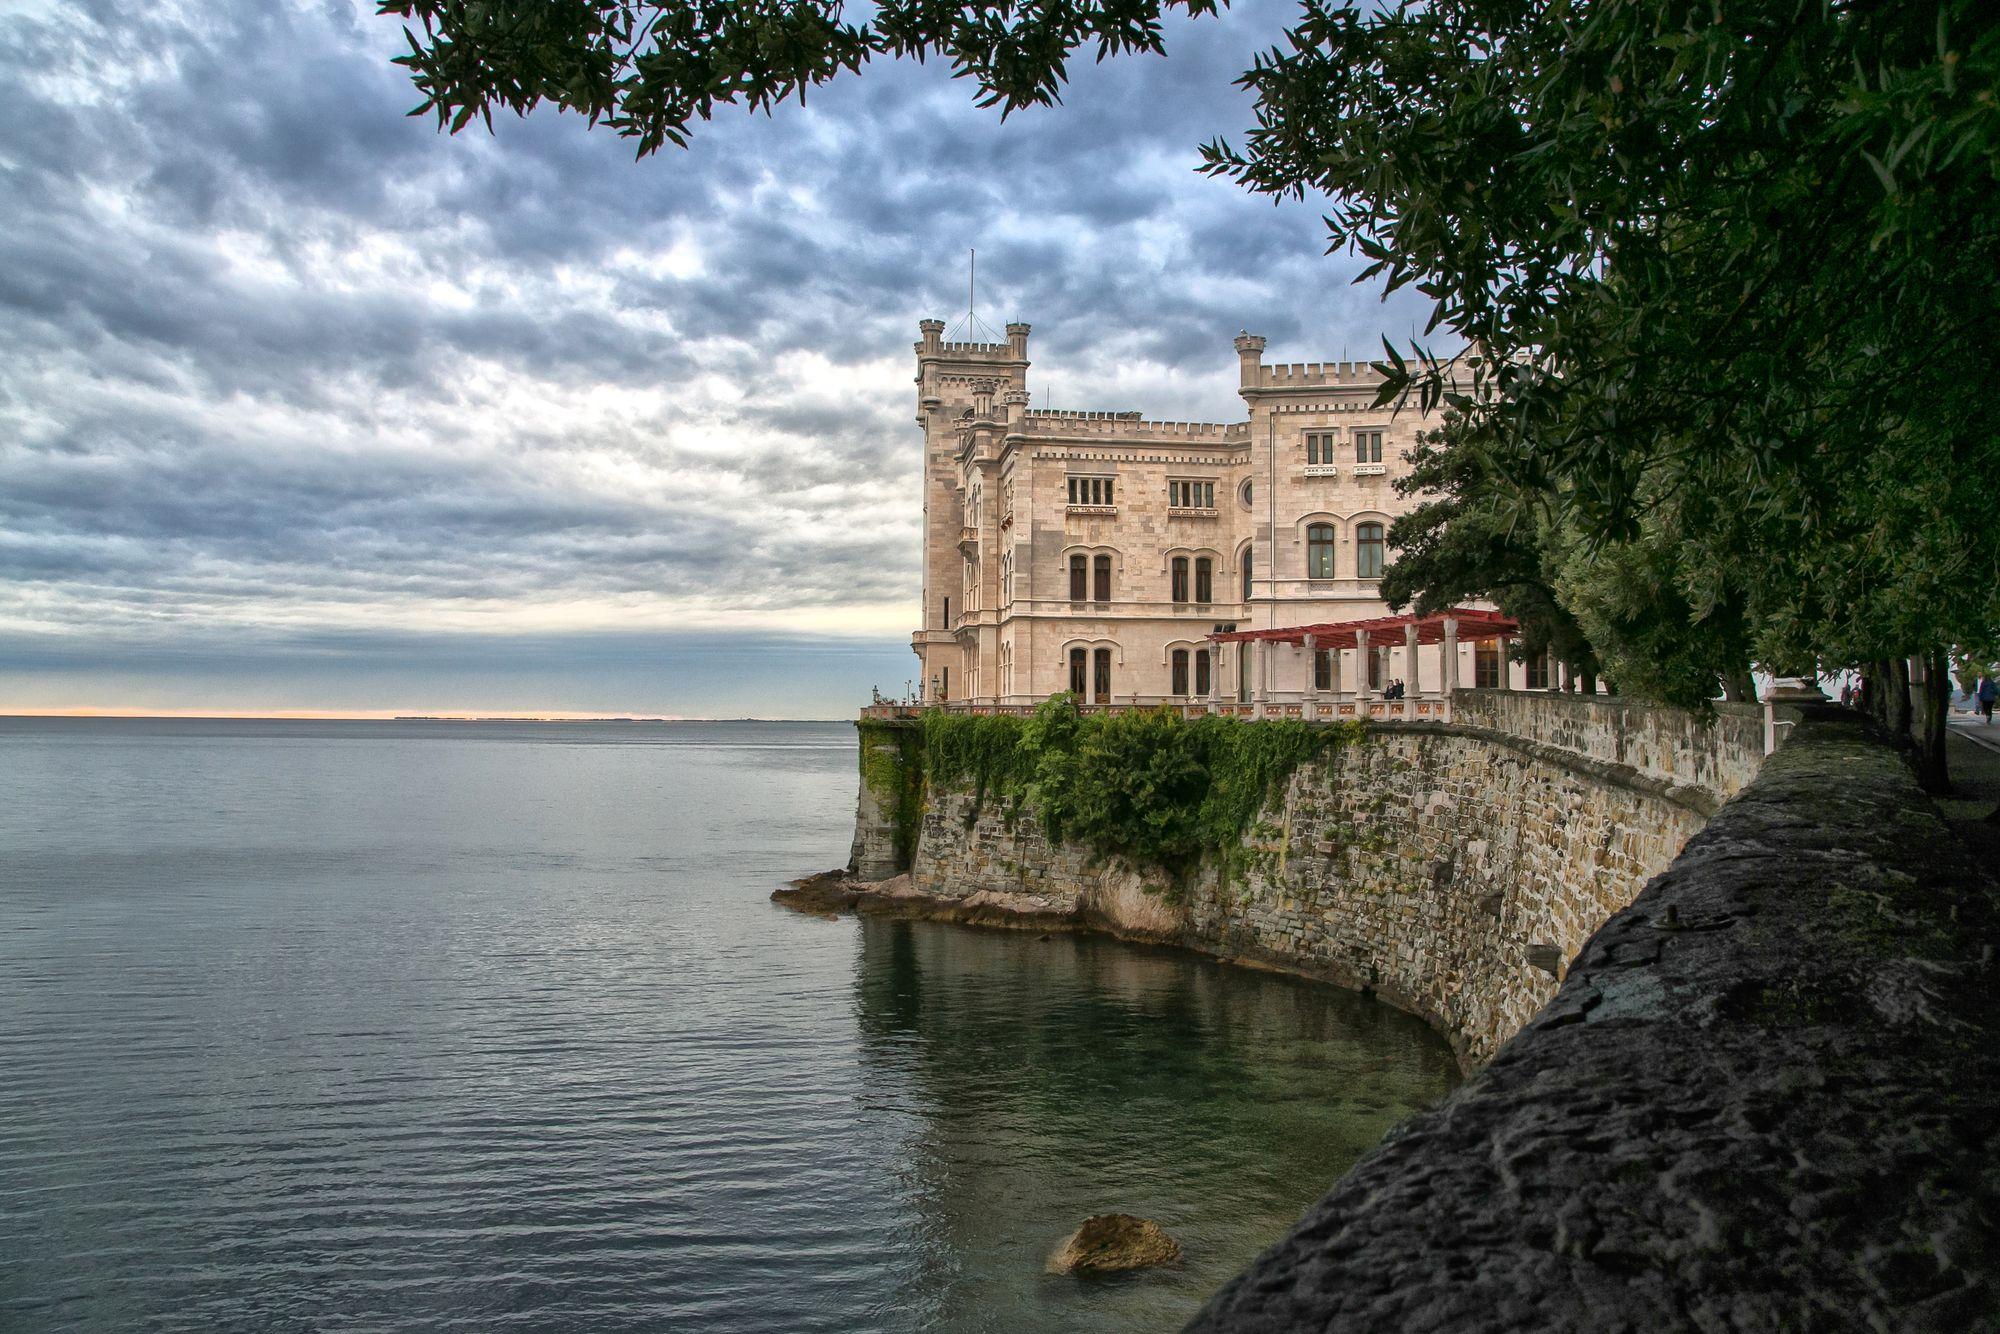 HDR Fotografie Schloss Miramare in Triest Italien.